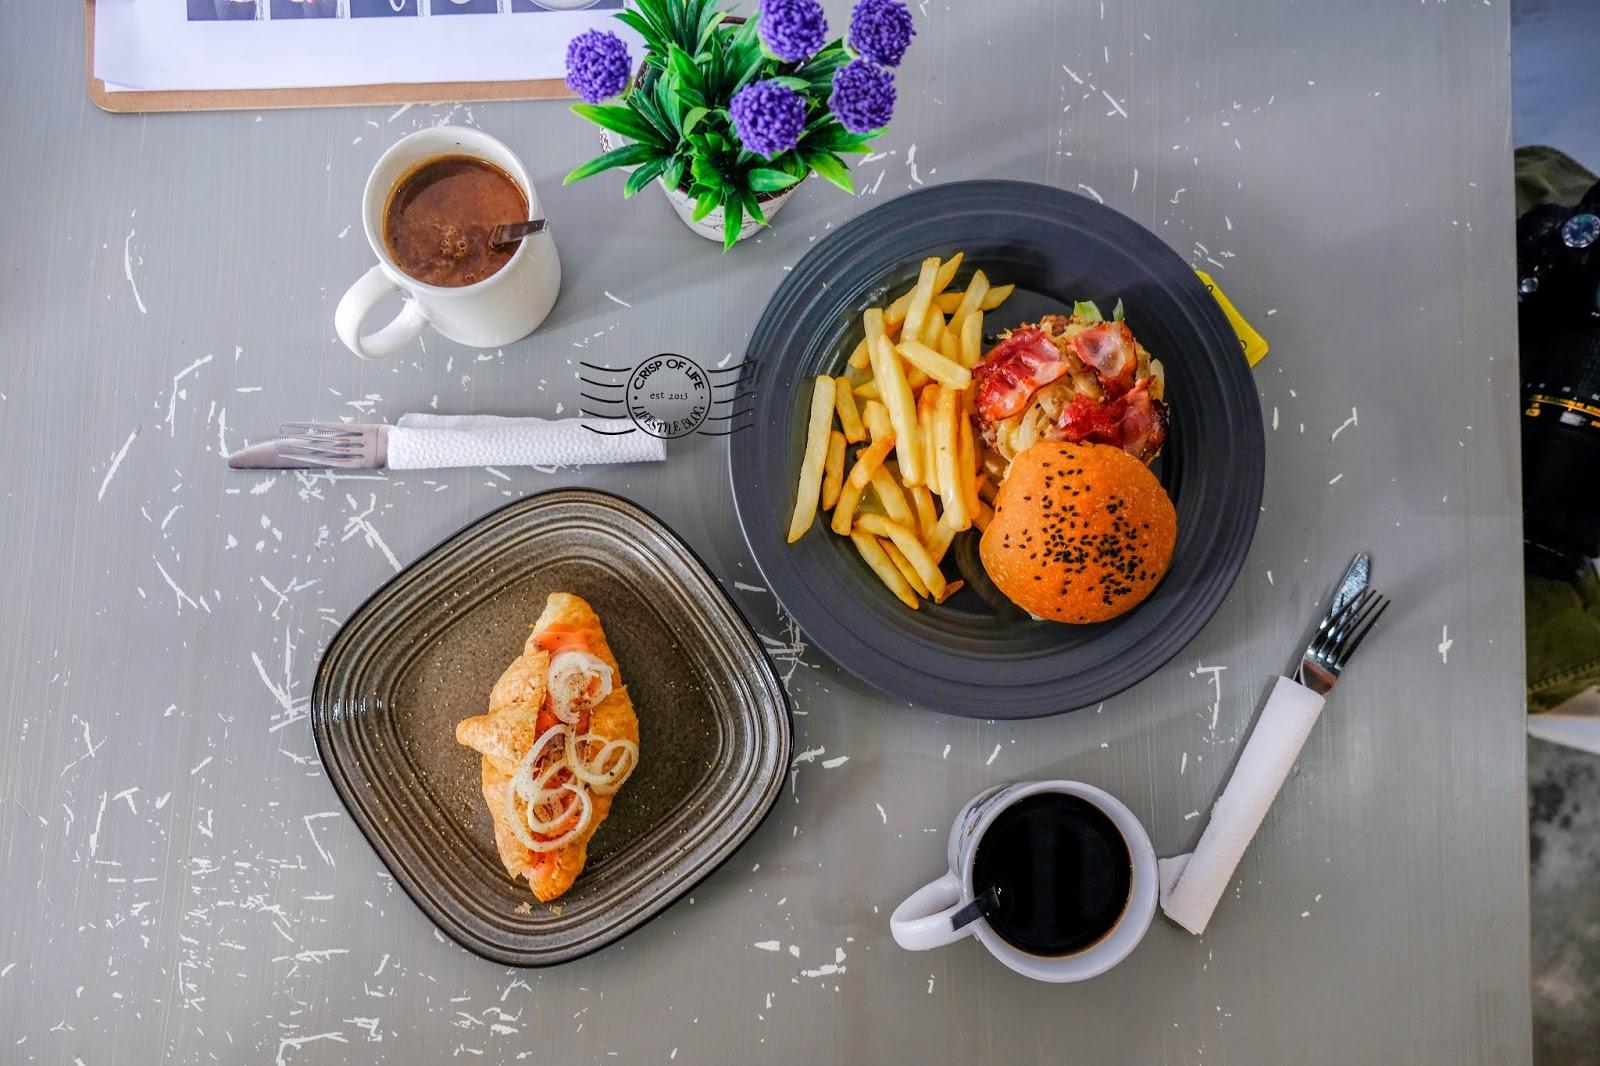 PepperSalt Restaurant @ Lorong Amoy, Georgetown, Penang